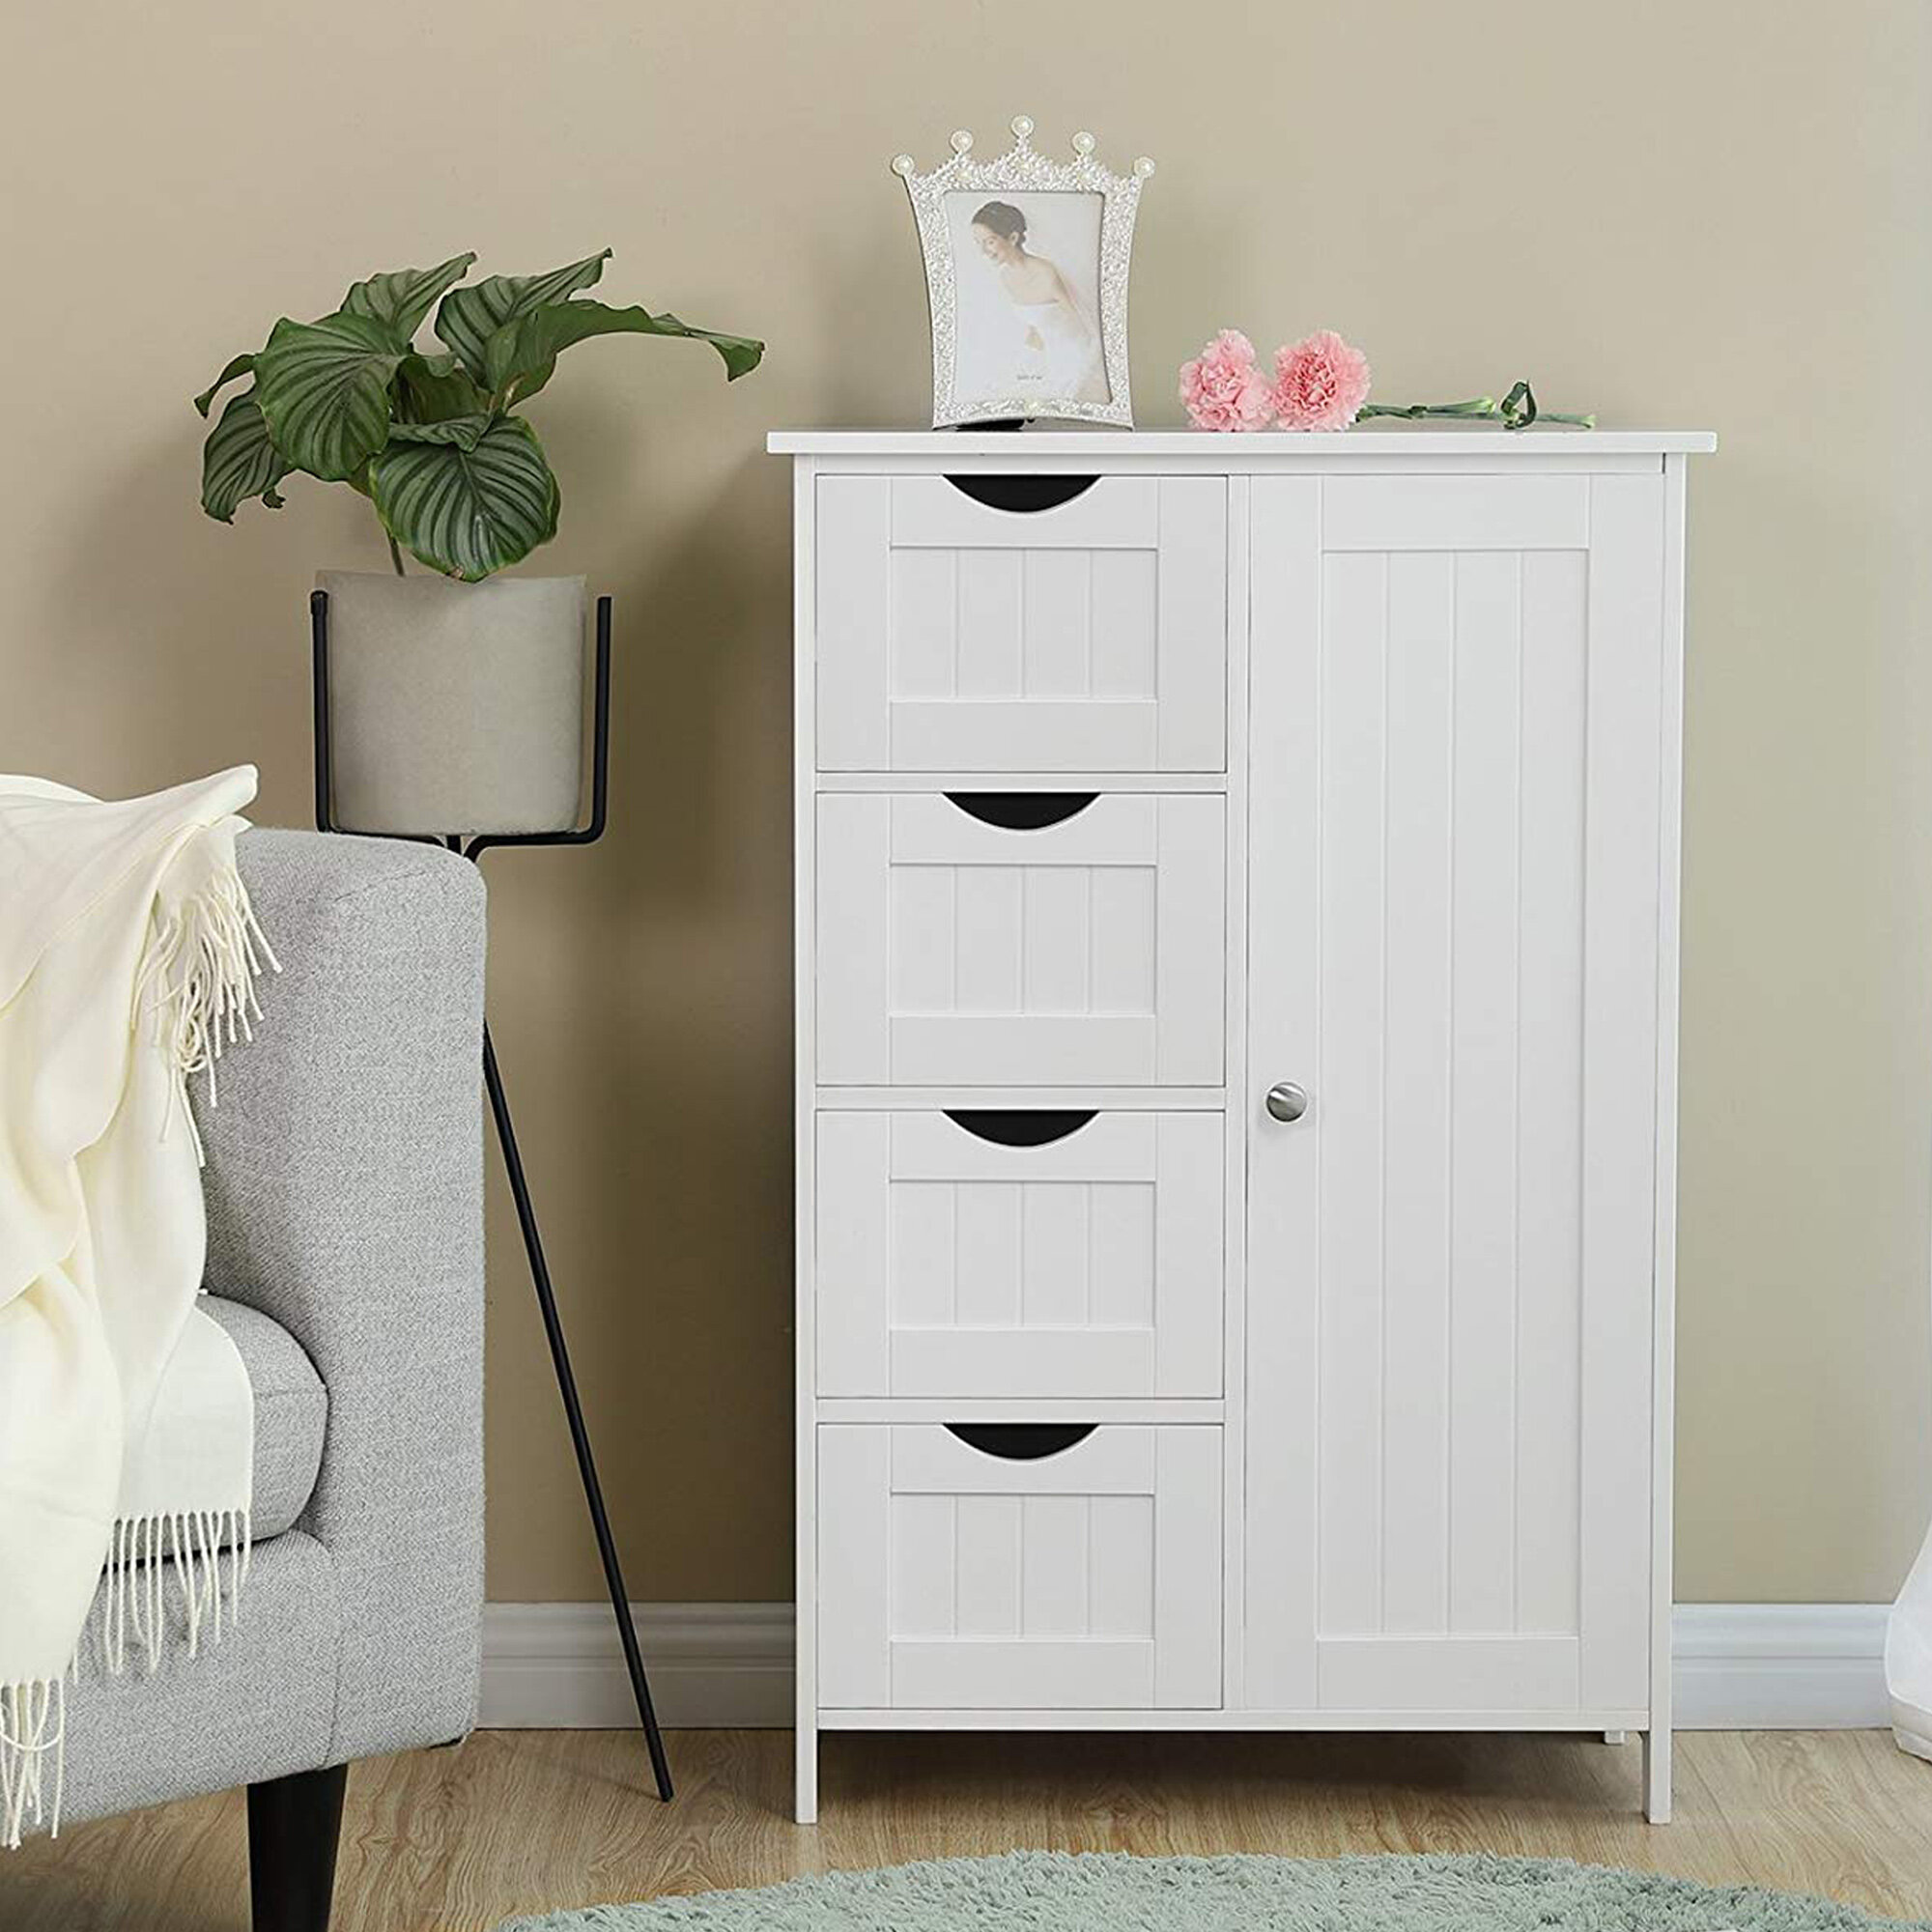 Rosecliff Heights Neo 21 7 W X 31 9 H X 11 8 D Free Standing Bathroom Cabinet Wayfair